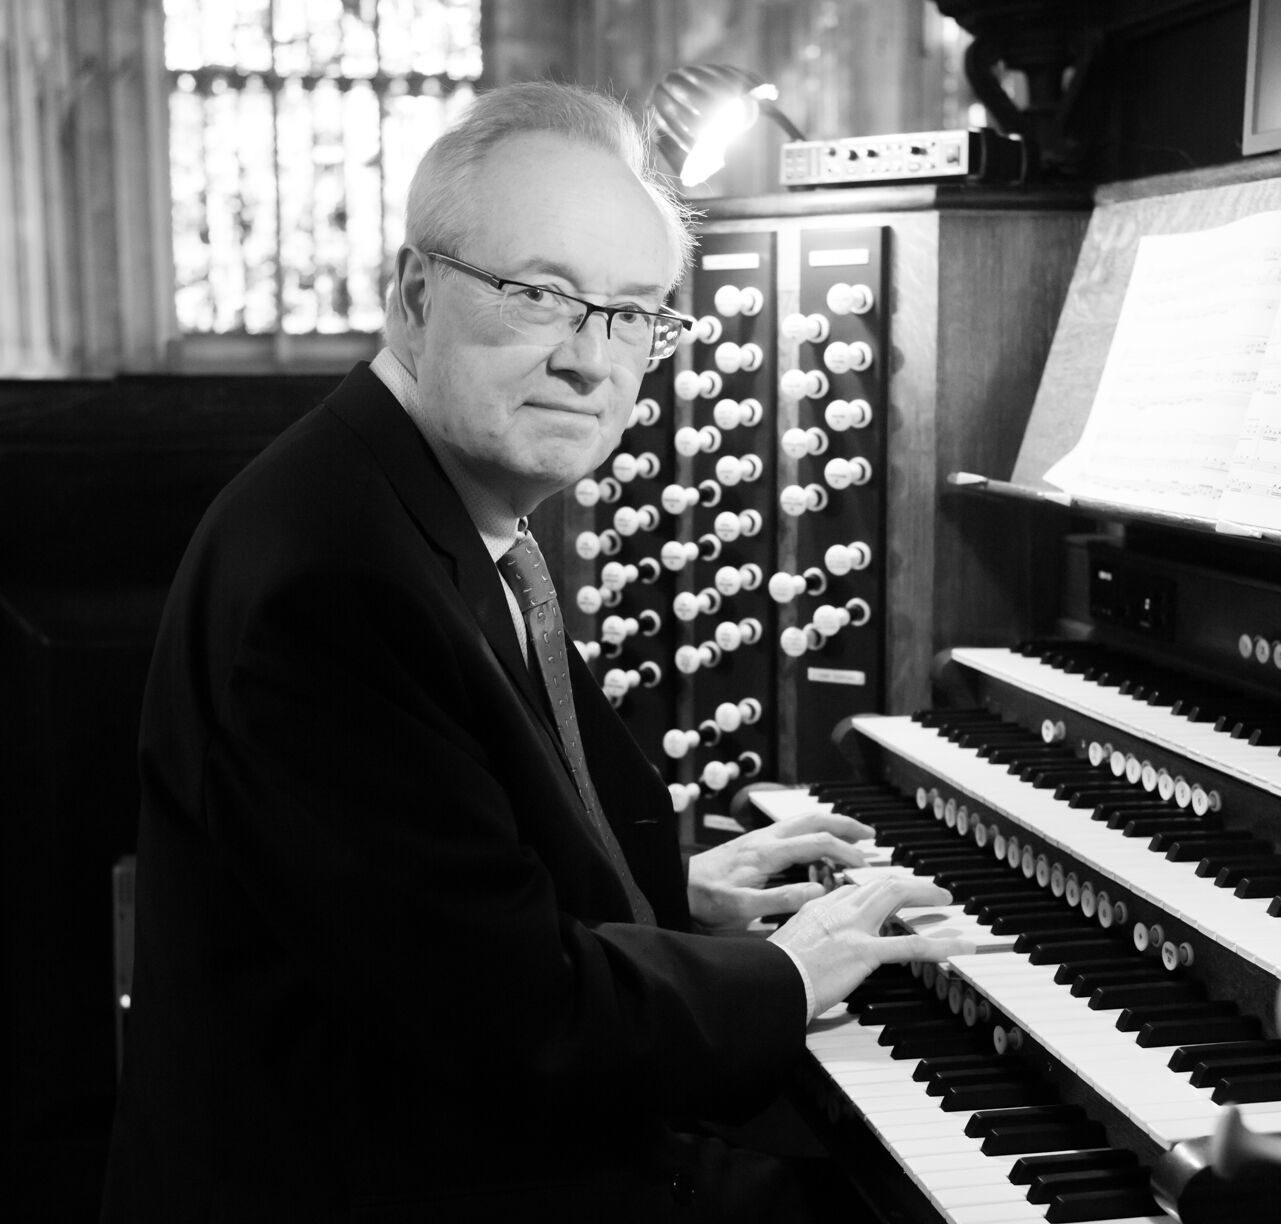 RIP Stephen Cleobury (1948-2019)